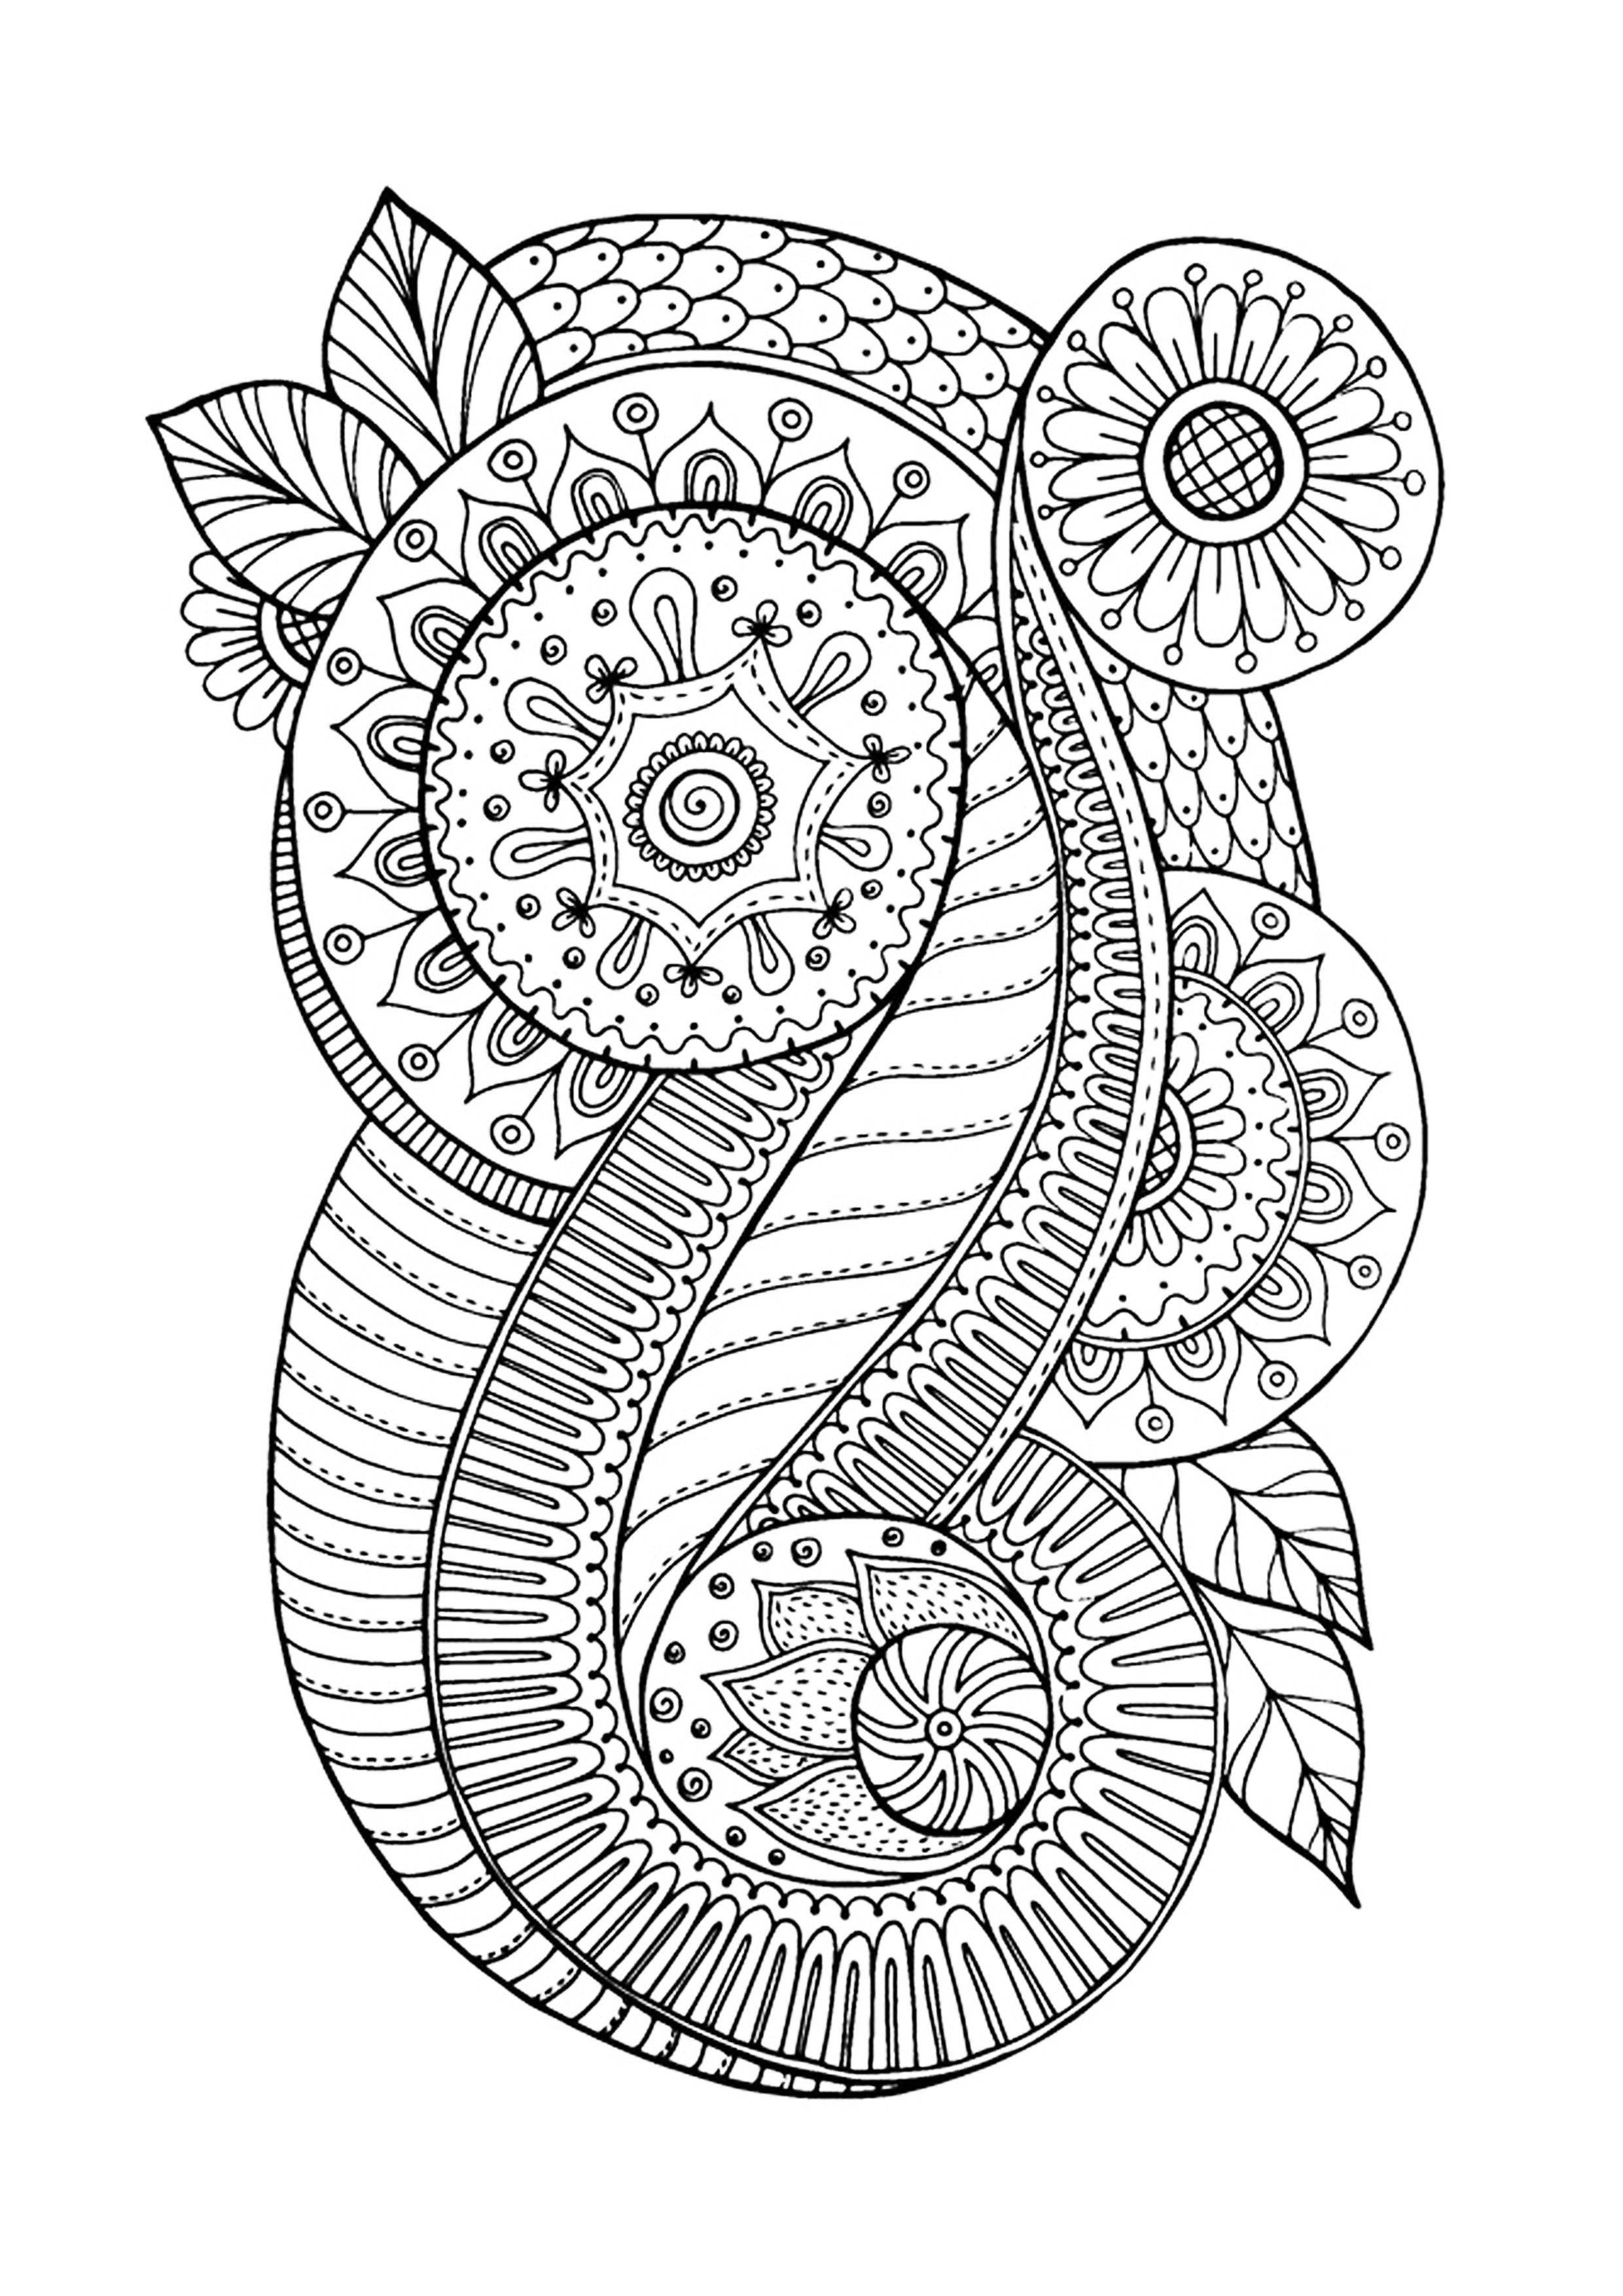 Zen Antistress Motif Abstrait Inspiration Florale 4 - Anti dedans Coloriage Anti Stress Adulte